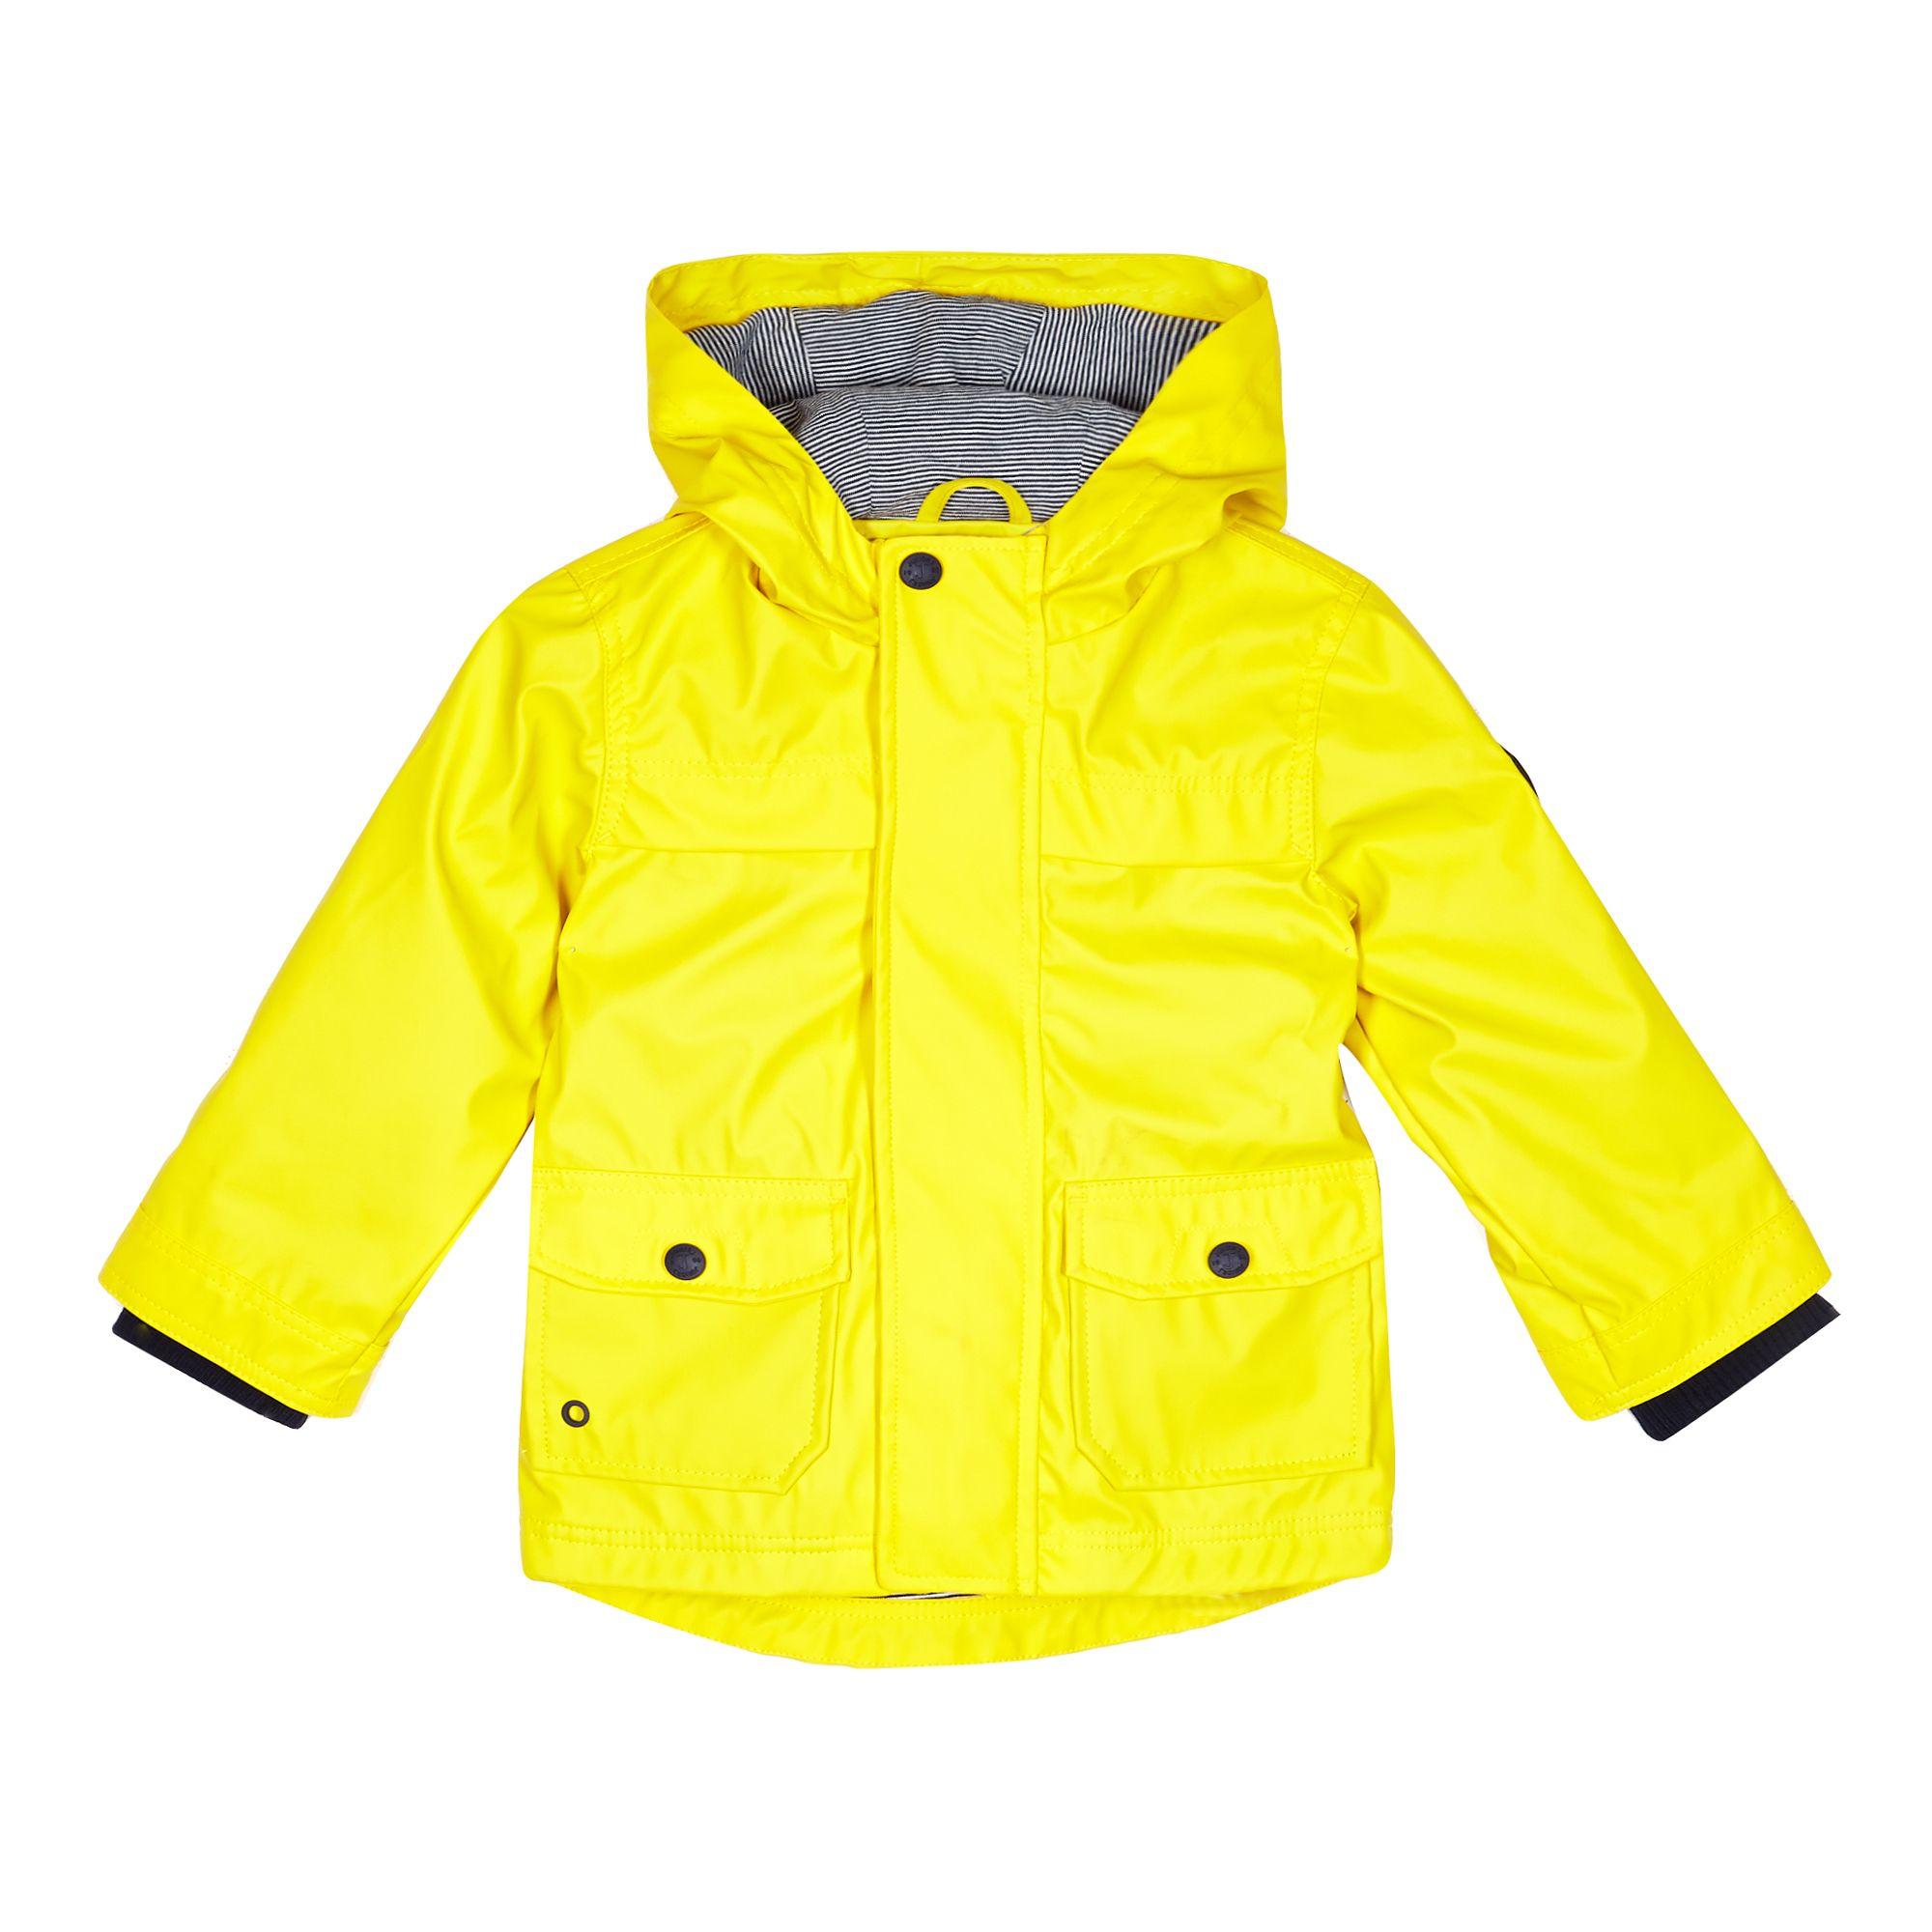 J By Jasper Conran Kids Boys' Yellow Raincoat From ...  J By Jasper Con...